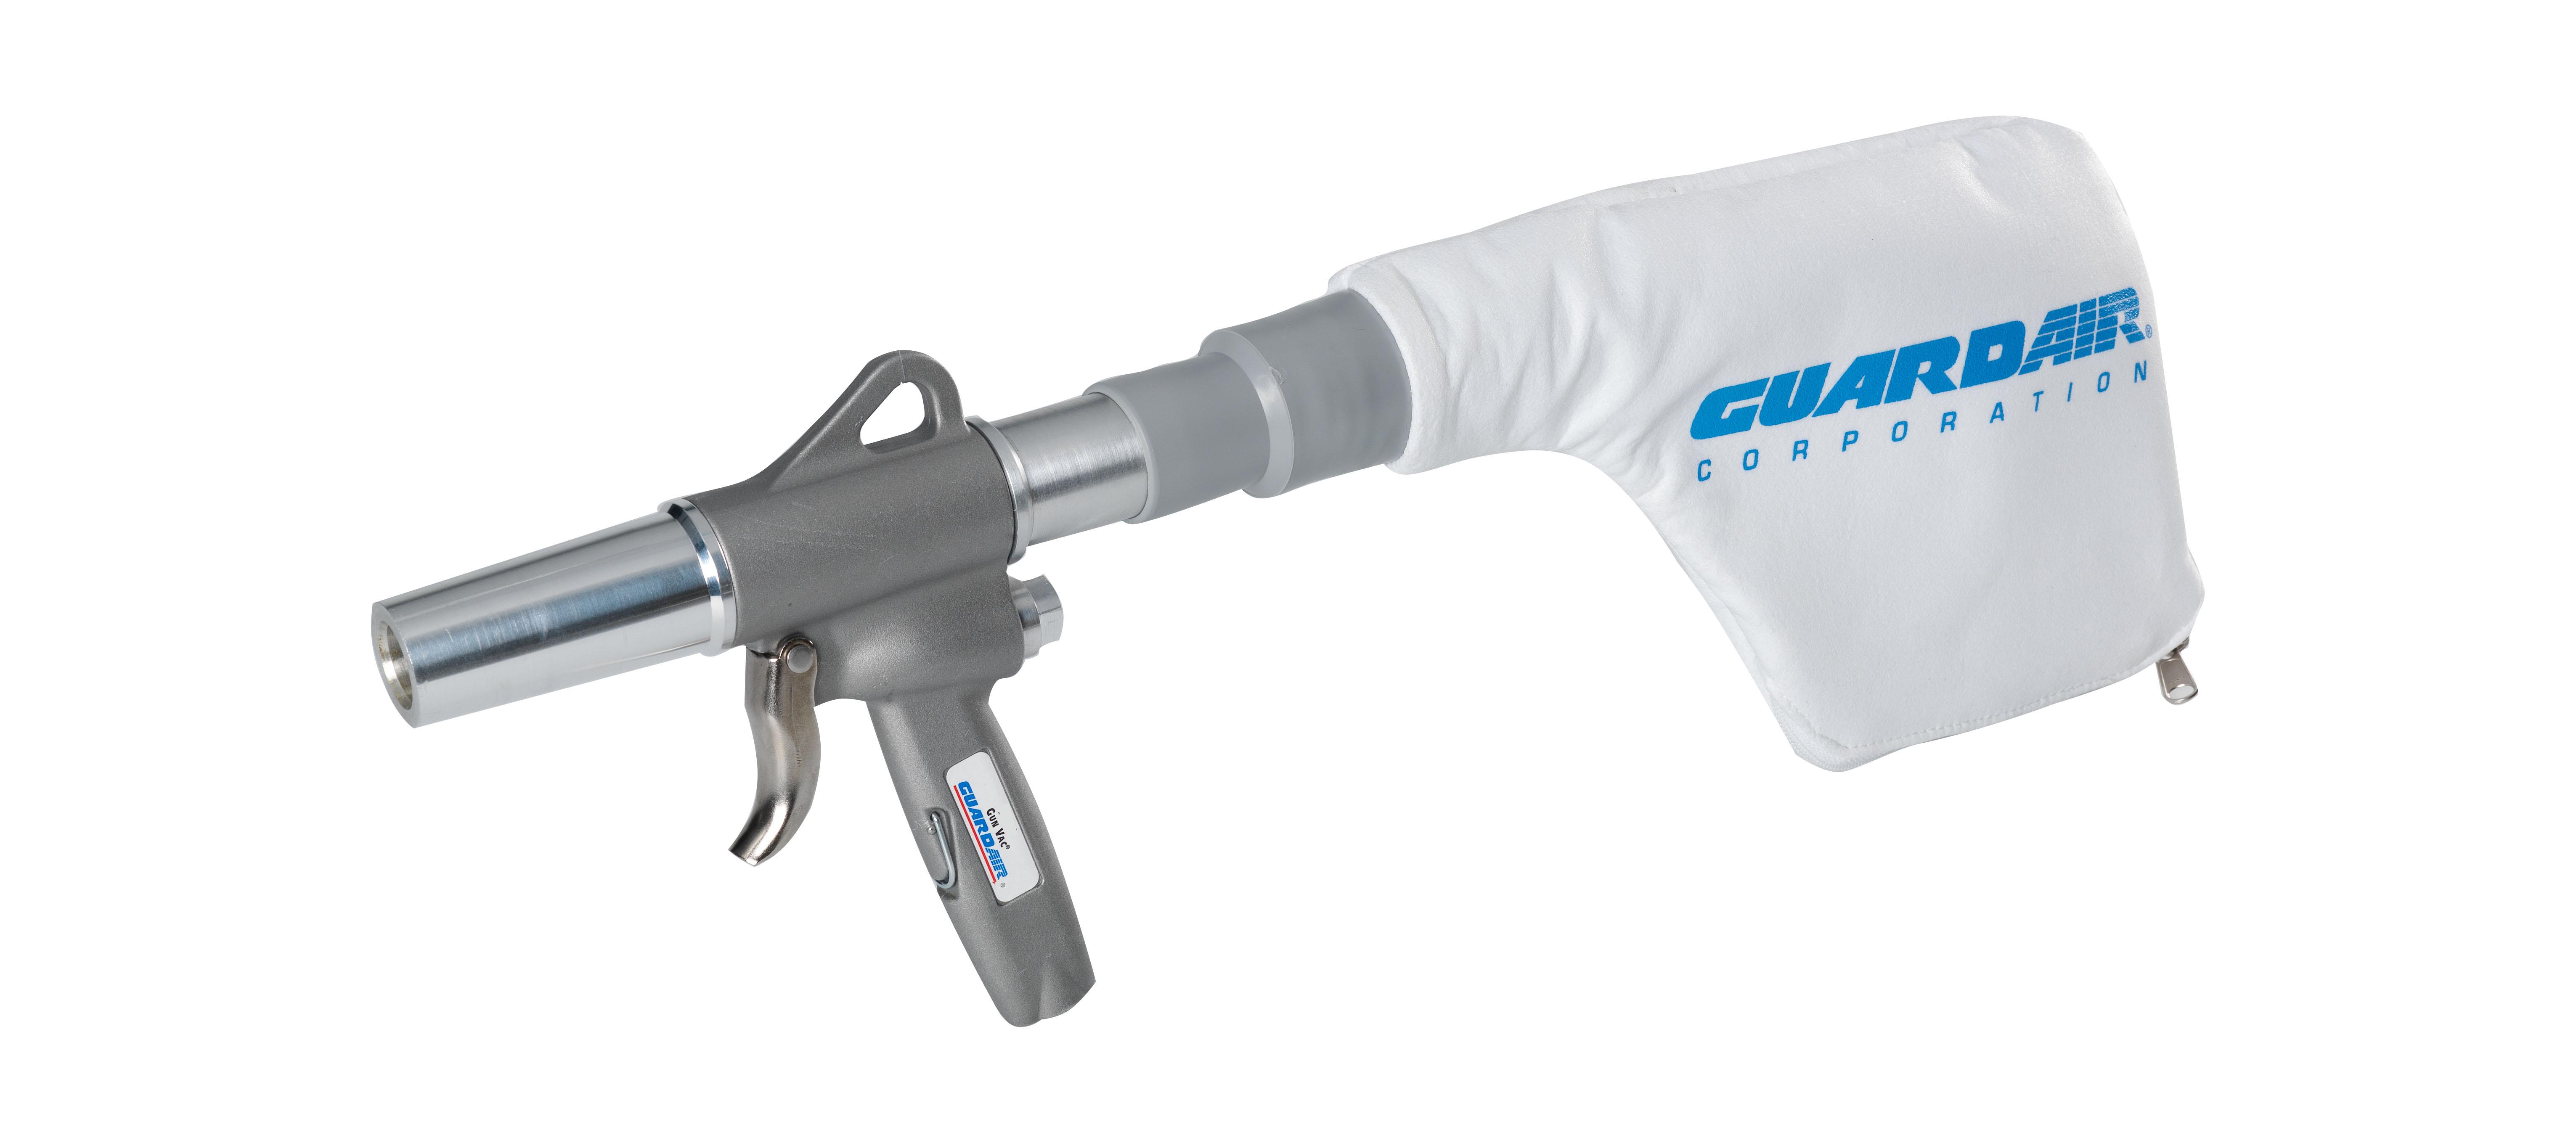 Air Powered Vacuum : Guardair corporation set to debut their gun vac